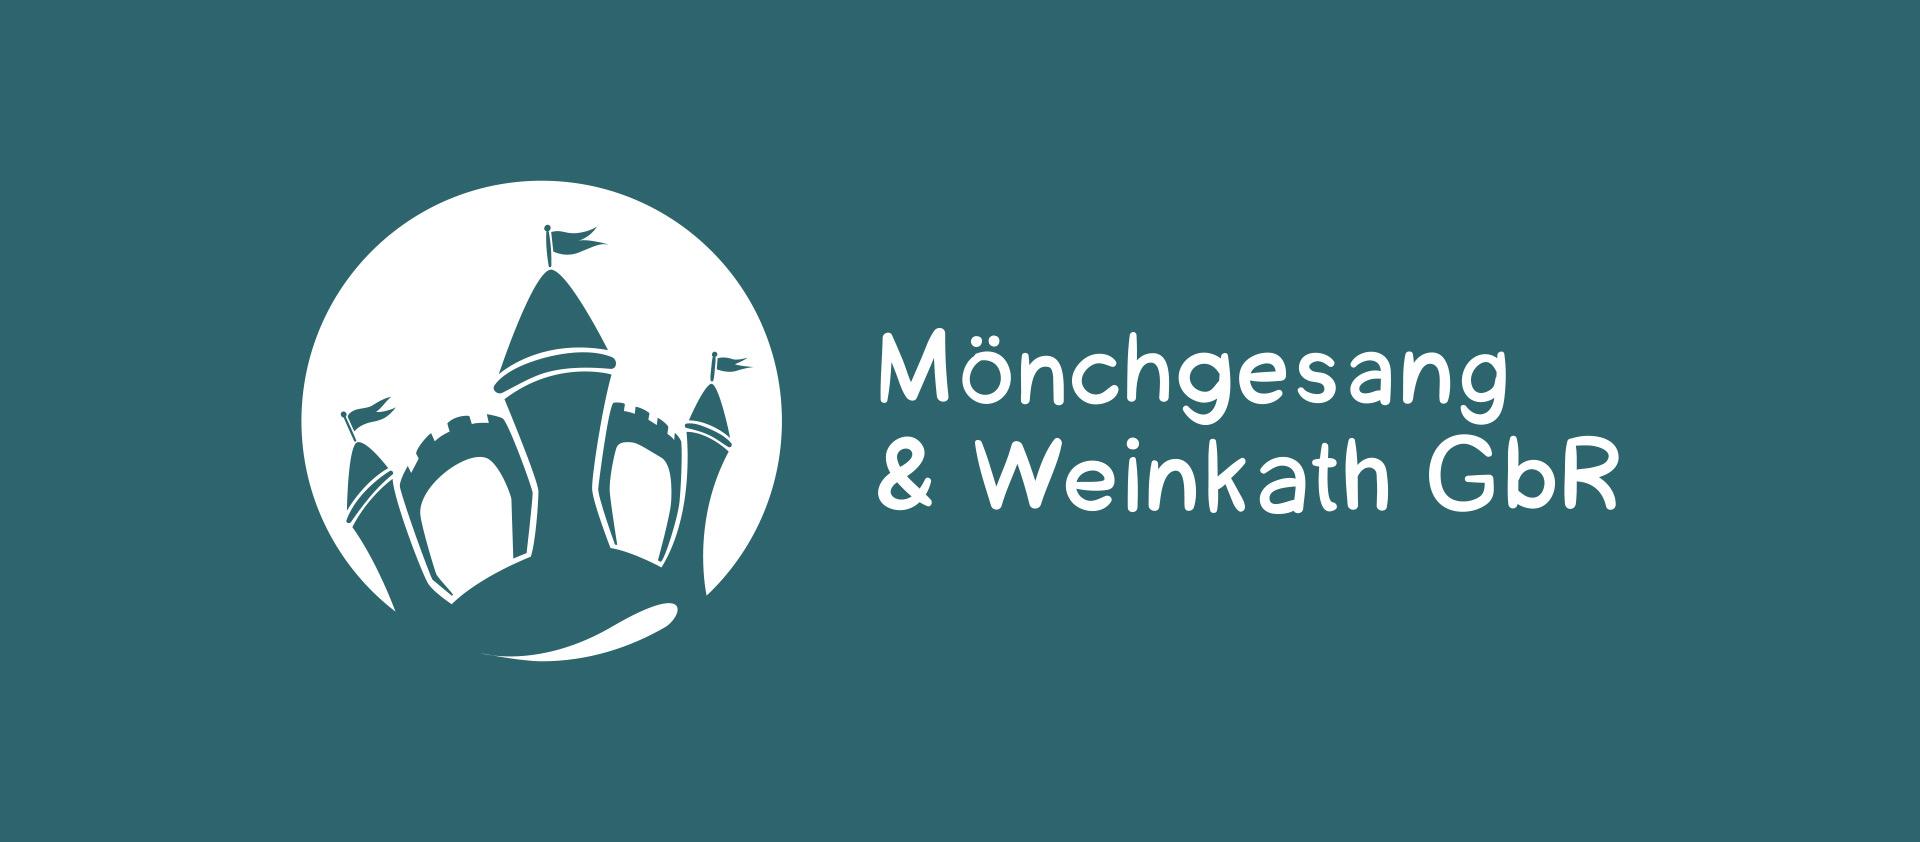 "Logodesign ""Mönchgesang & Weinkath Gbr"""""